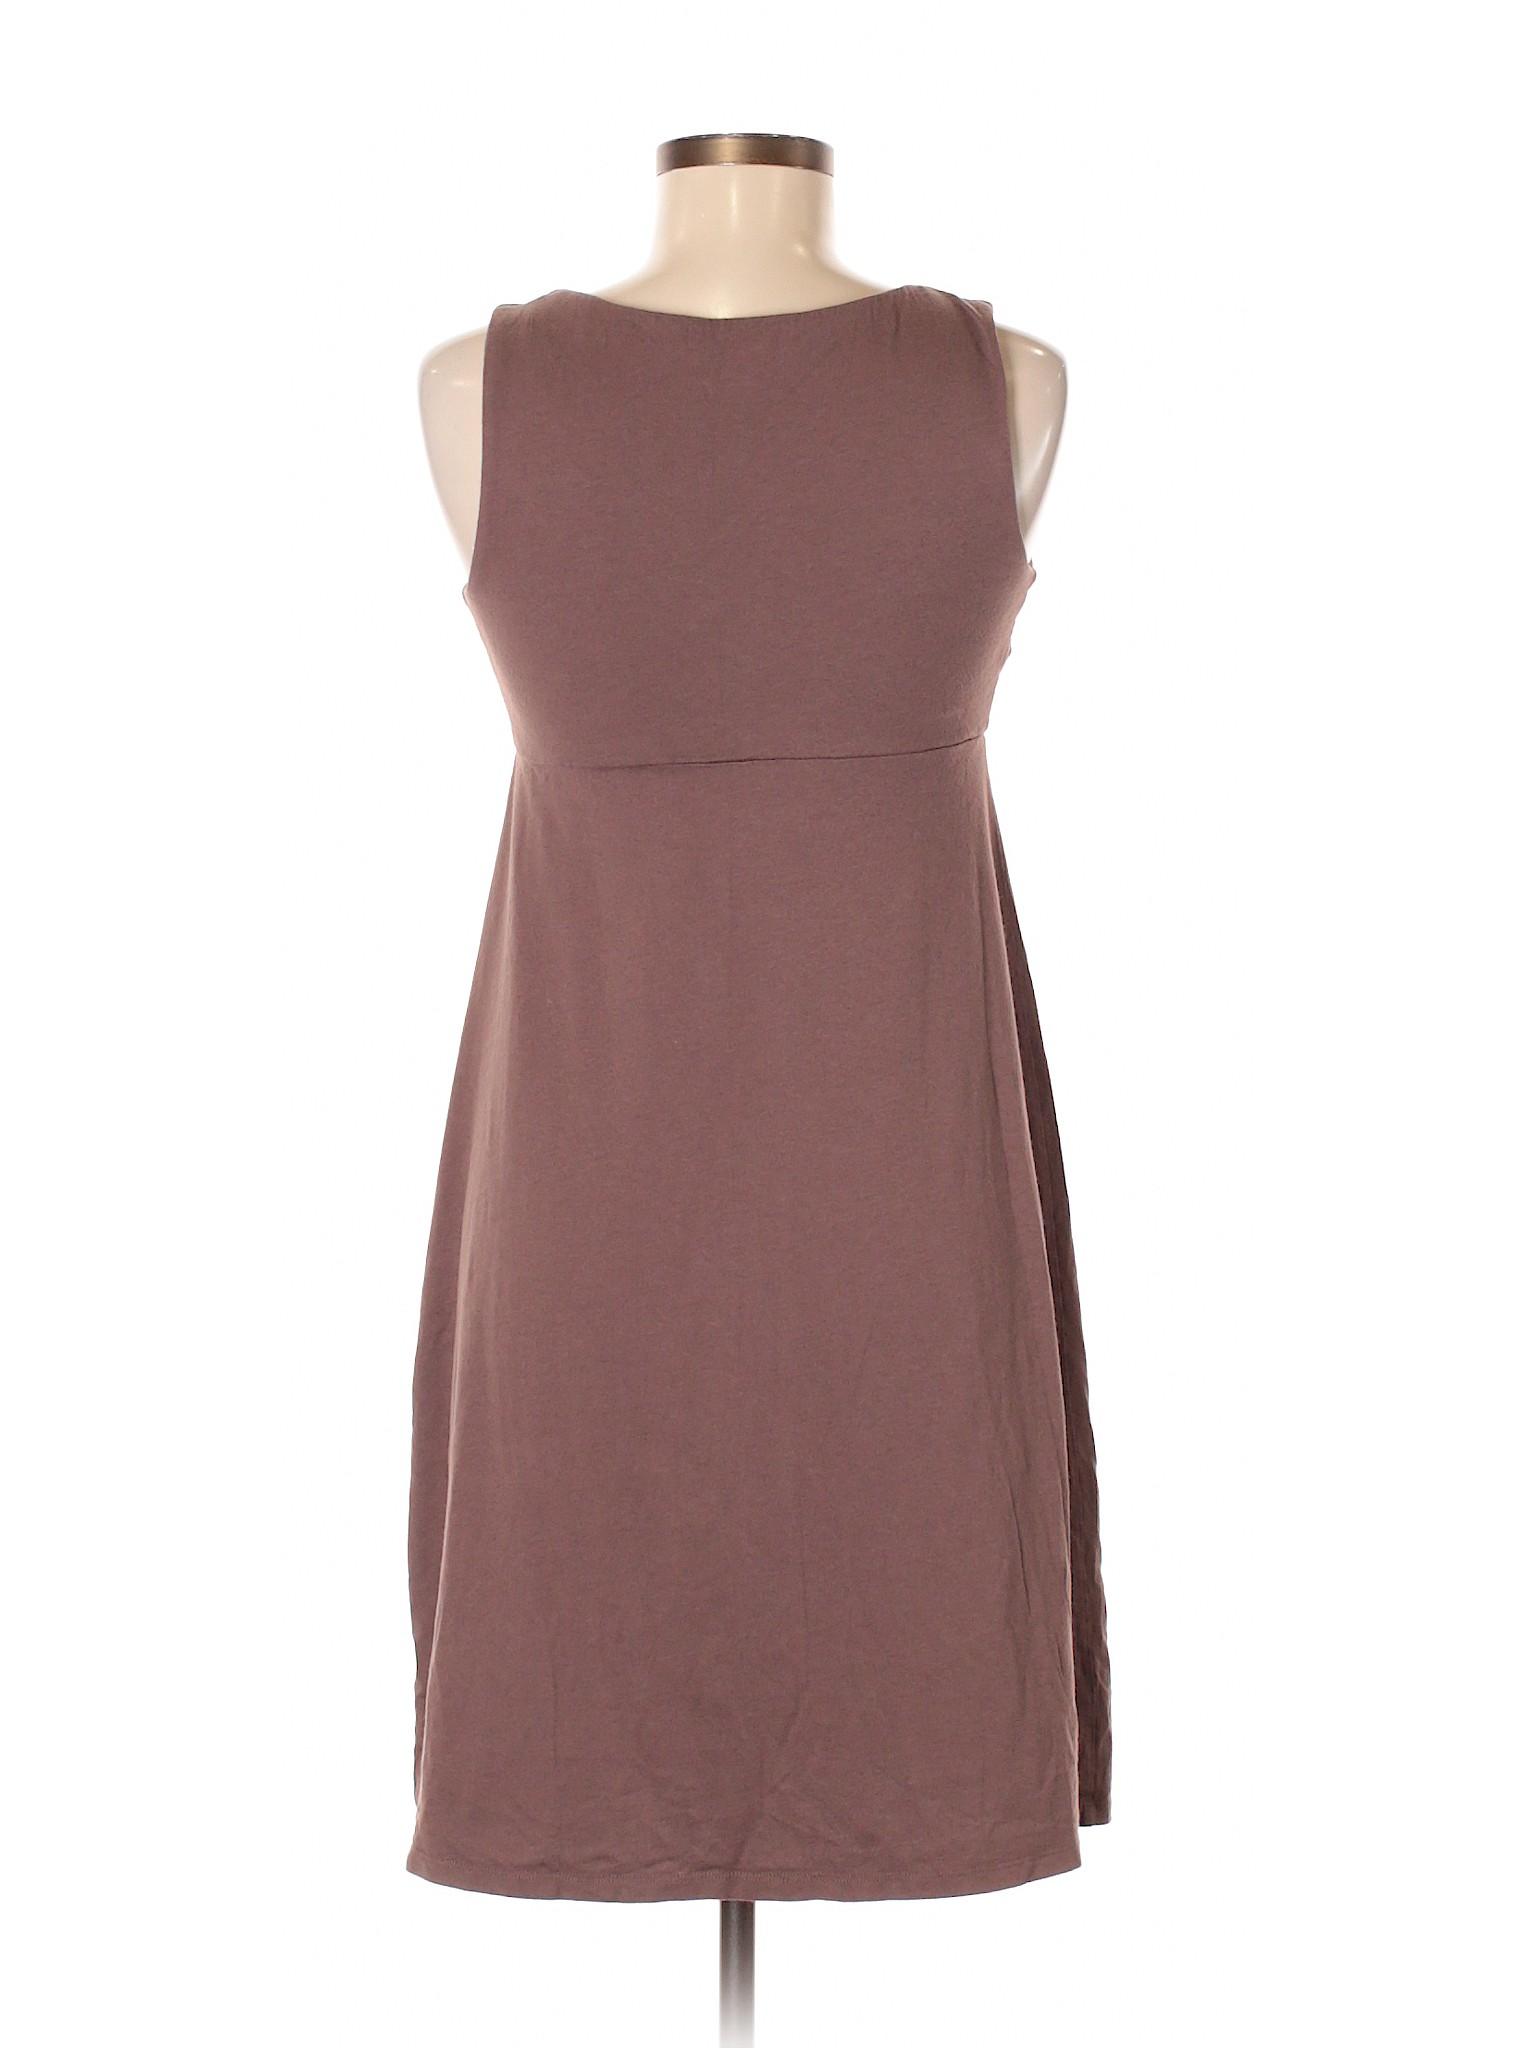 Boden winter Boden winter Boutique Casual Dress Dress Casual Boutique winter Boutique Boden a1Enawx